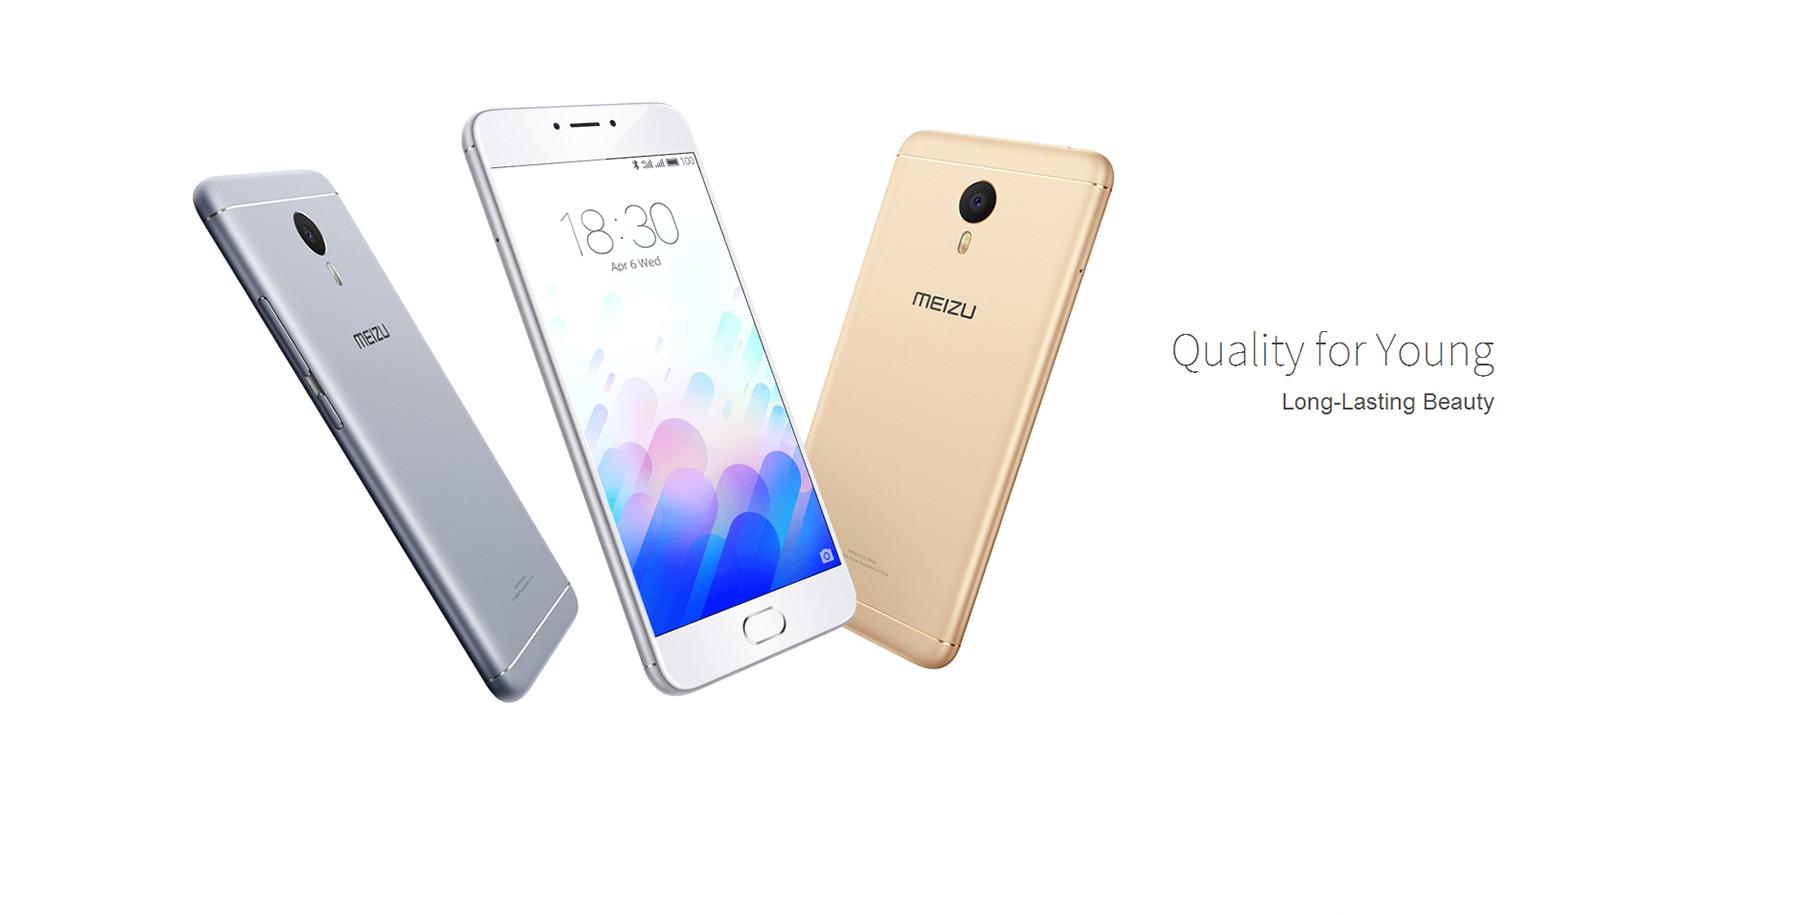 MEIZU M3 Note International Edition Android 5.1 4G Phablet with 5.5 inch FHD Screen Helio P10 Octa Core 3GB RAM 32GB ROM Fingerprint 13MP Rear Camera IR Proximity Sensor